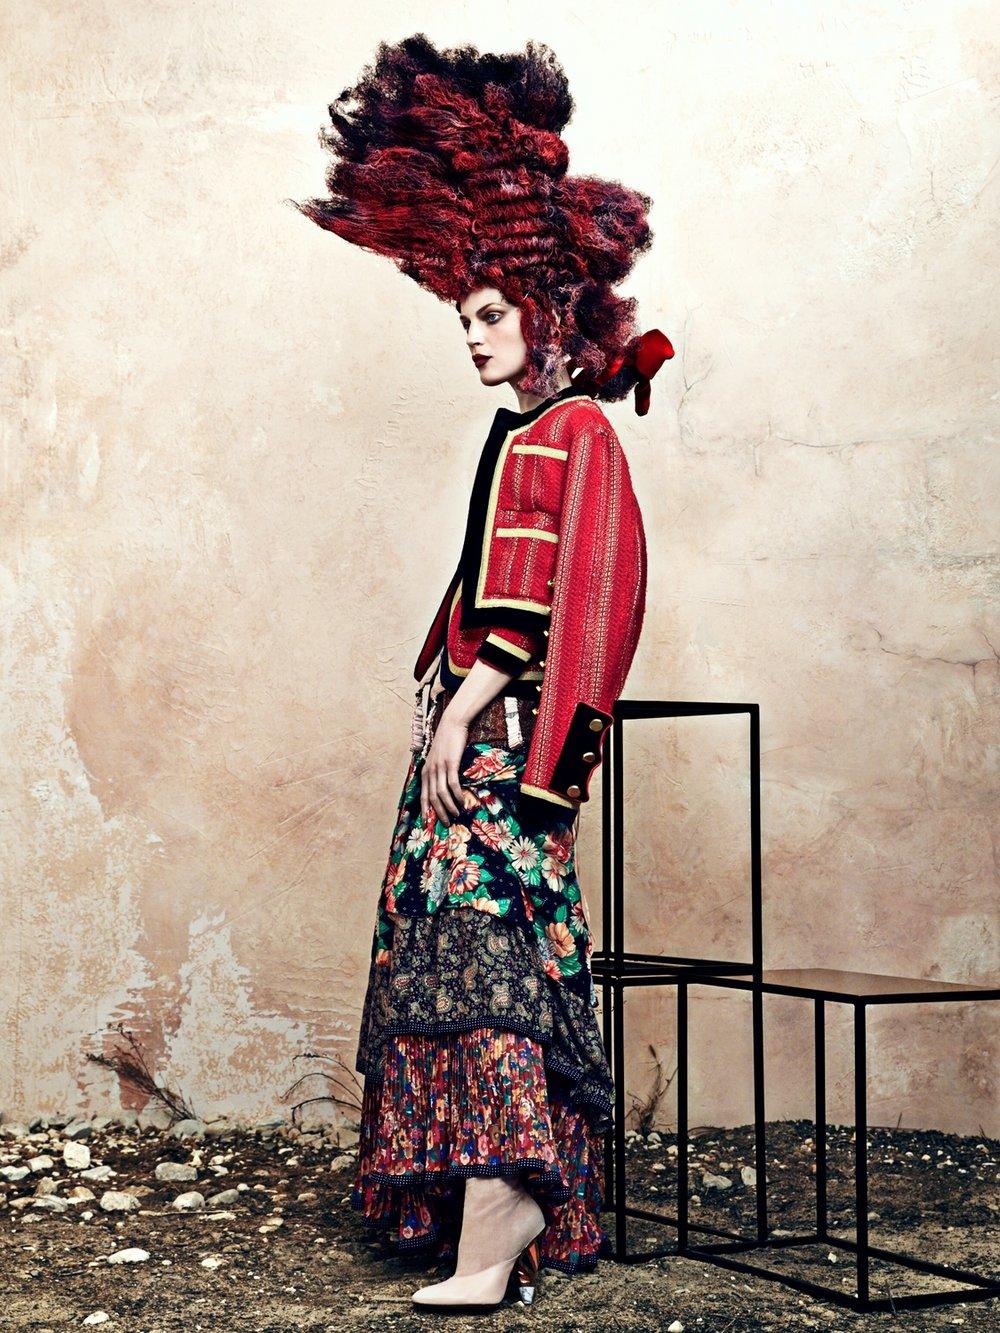 cr-fashion-book-no9-fall-winter-2016-guinevere-van-seenus-by-bjorn-iooss-09.jpg